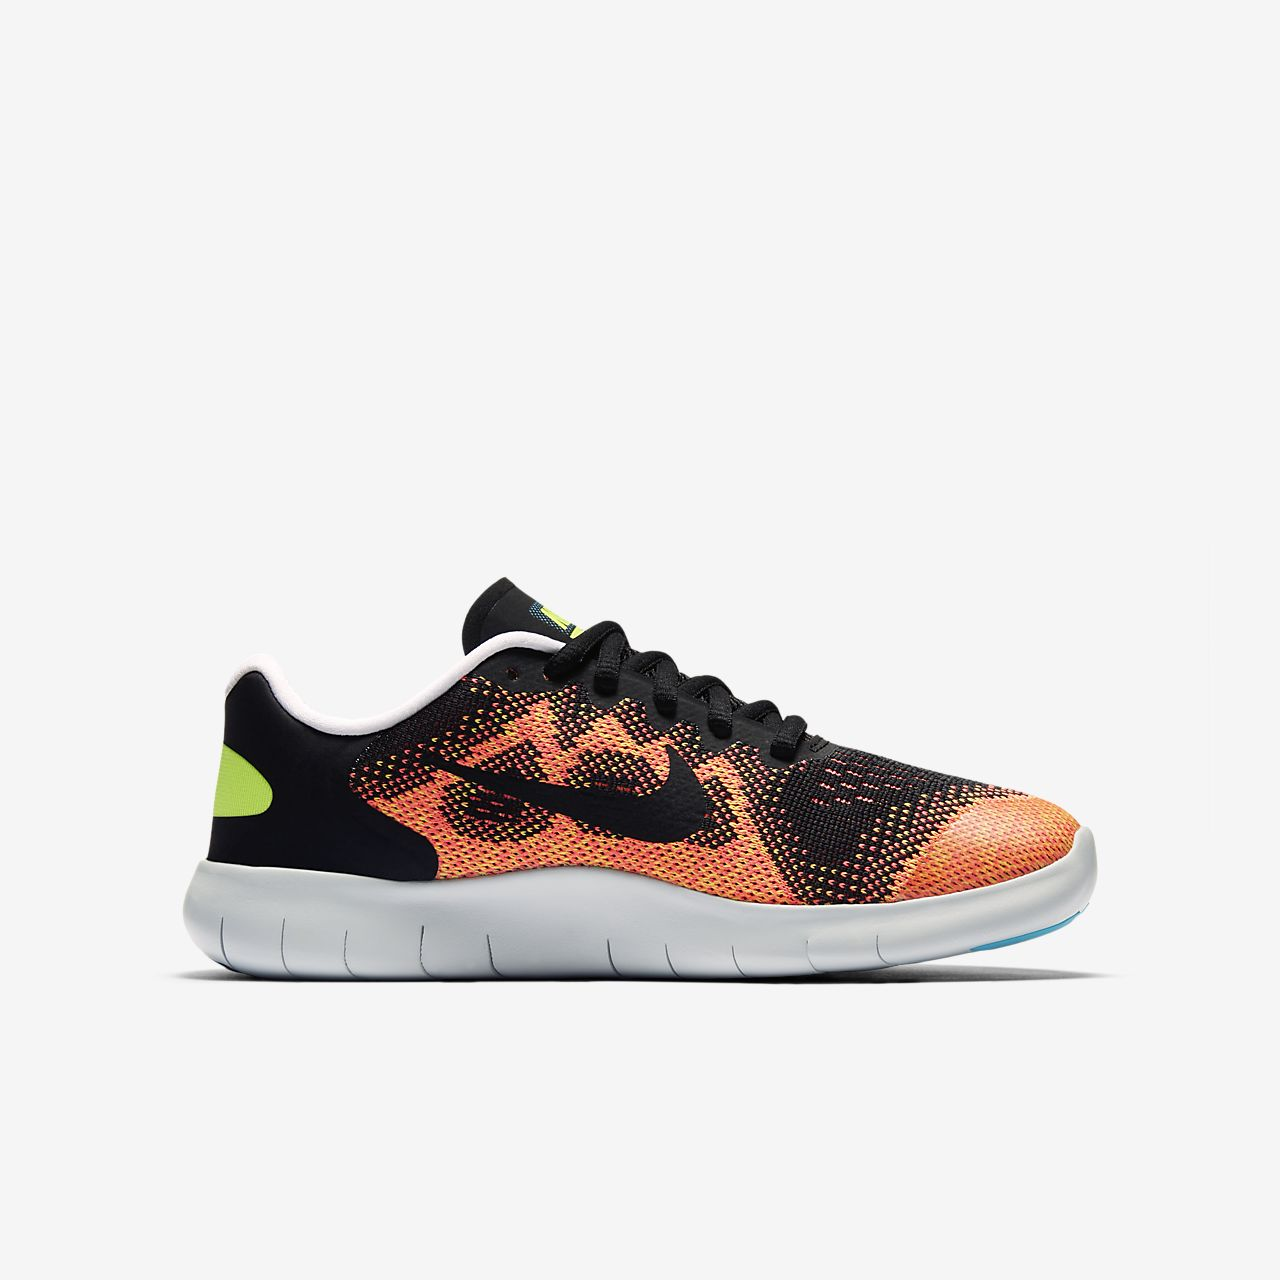 ... Calzado de running para niños talla grande Nike Free RN 2017